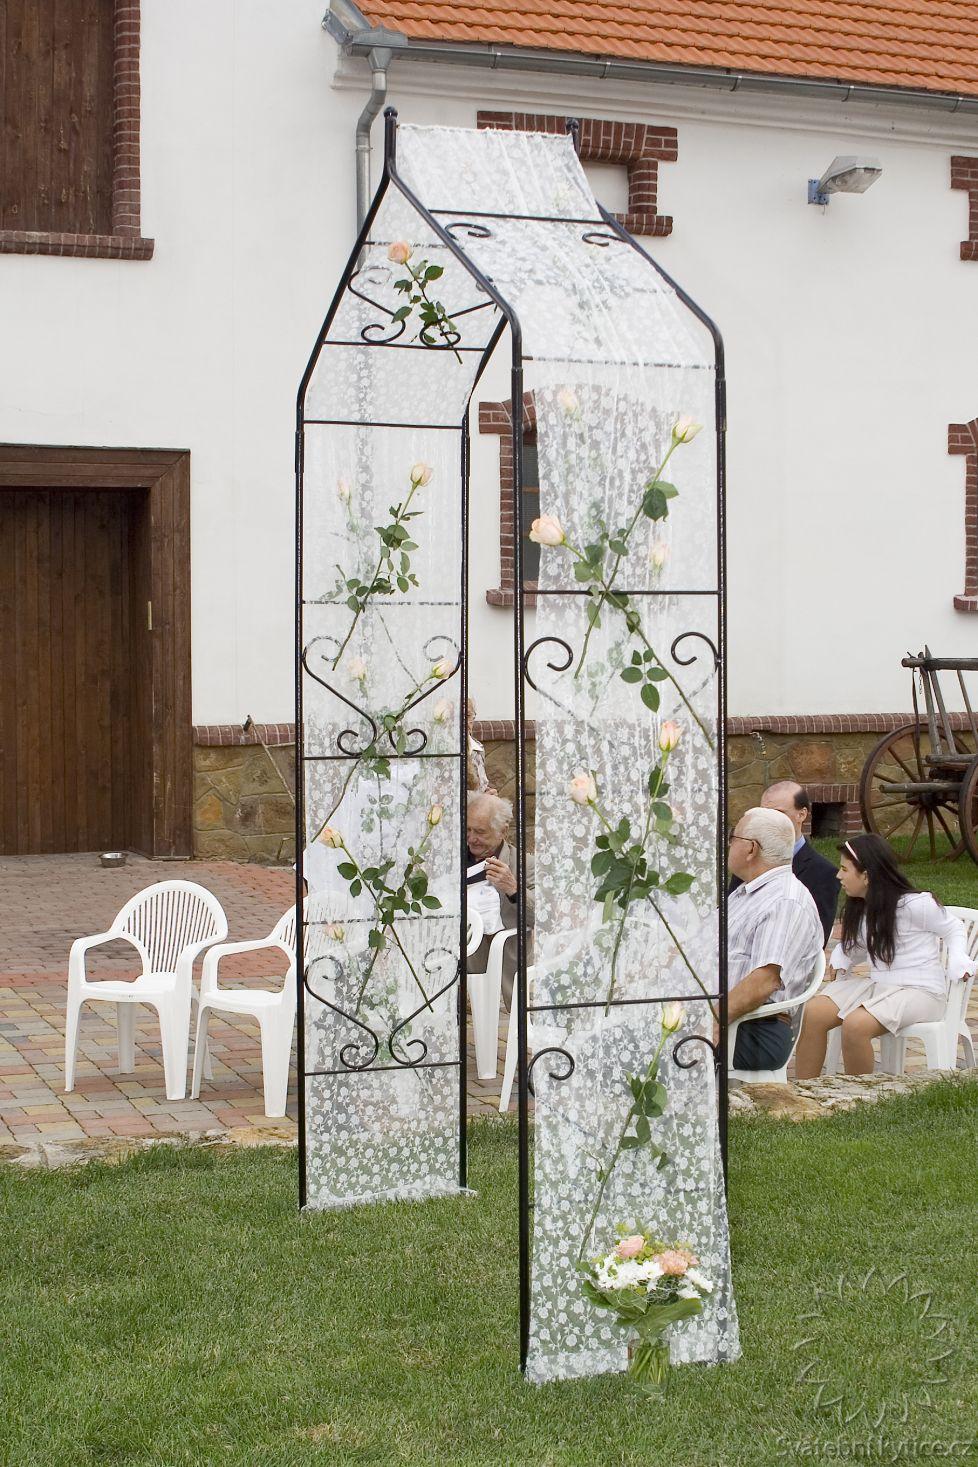 Kvetinovy Svatebni Oblouk 403 Svatebni Kytice Cz